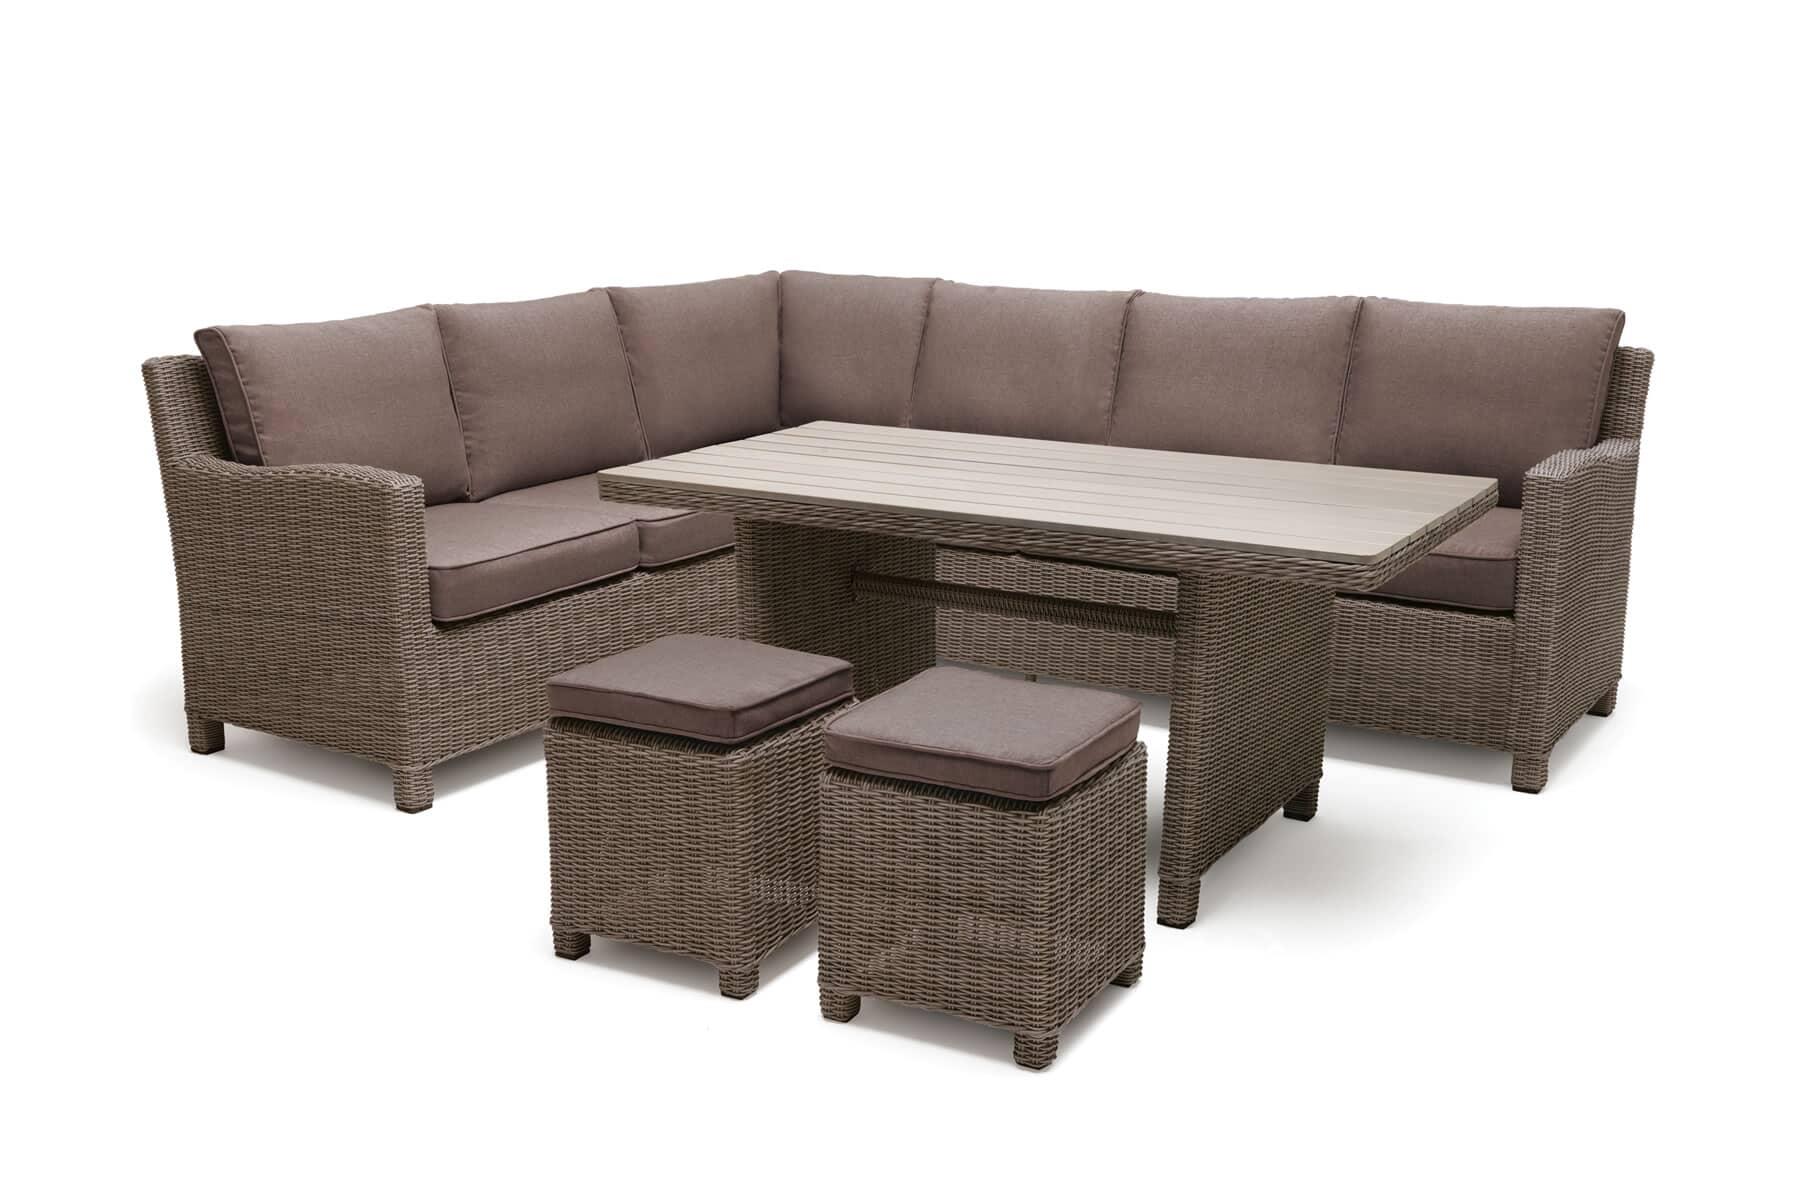 kettler palma casual dining corner set rh rattan kpalcor01 garden furniture world. Black Bedroom Furniture Sets. Home Design Ideas